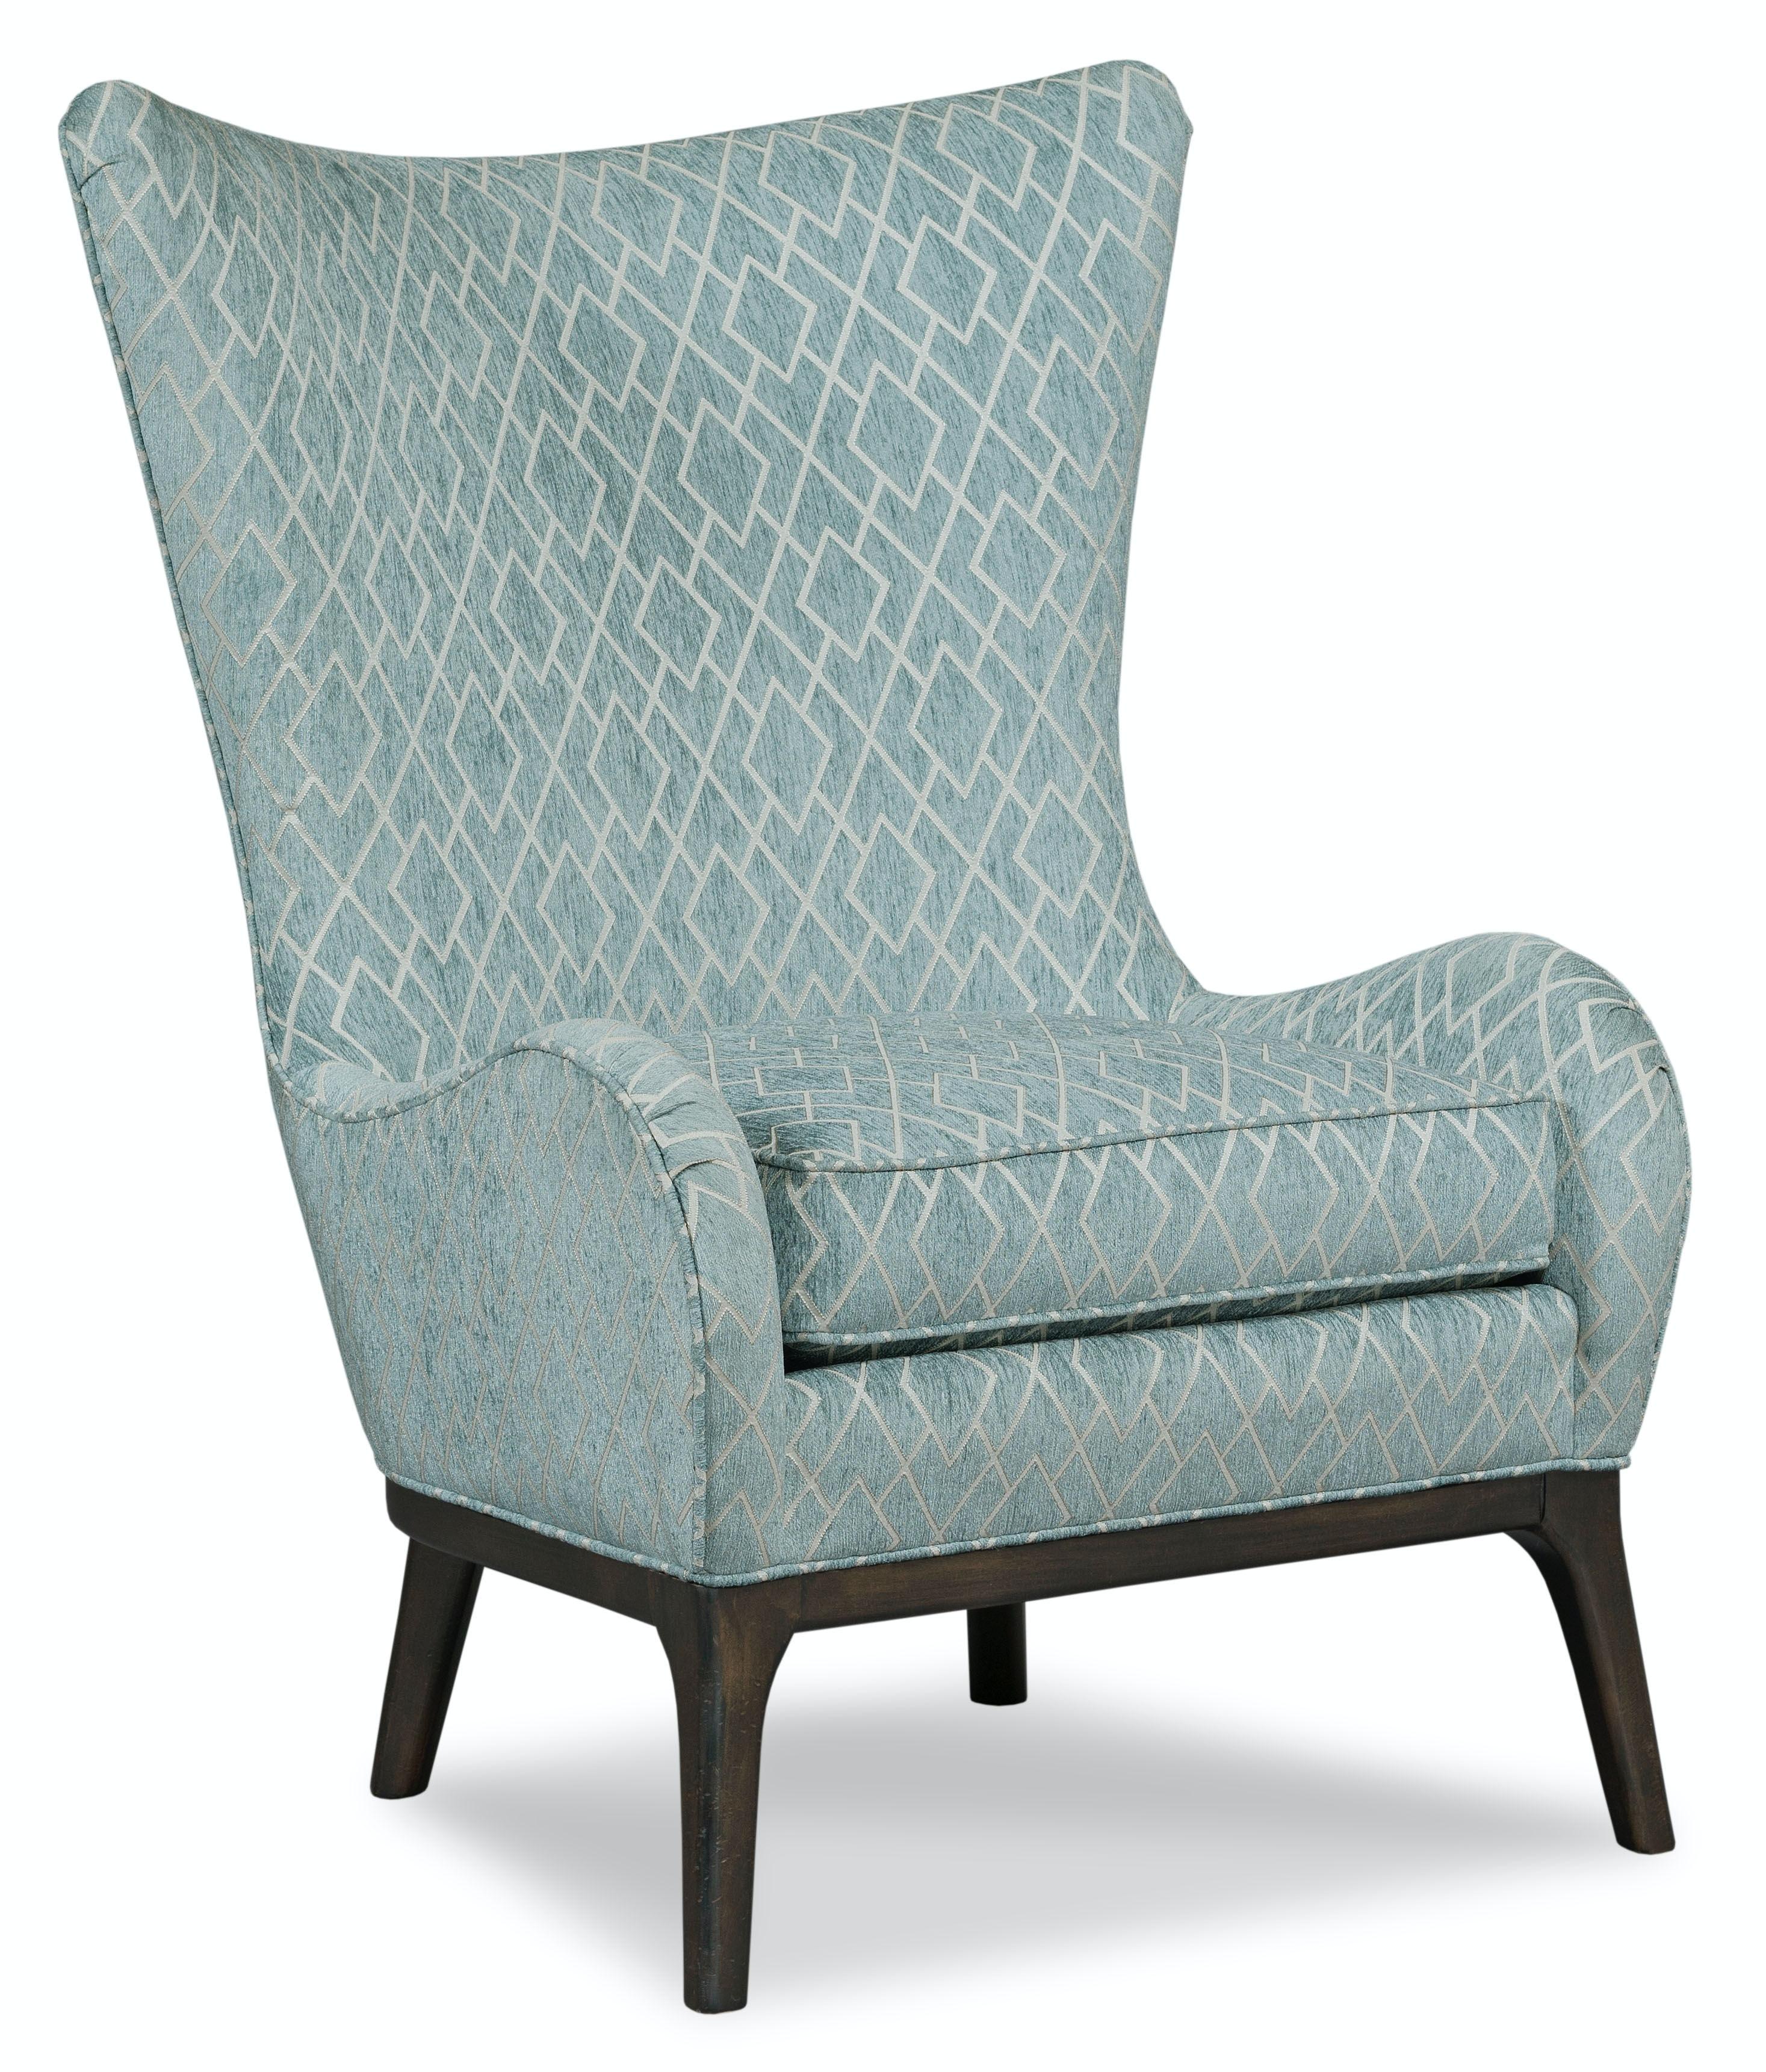 Fairfield Chair Company Wing Chair 5135 01